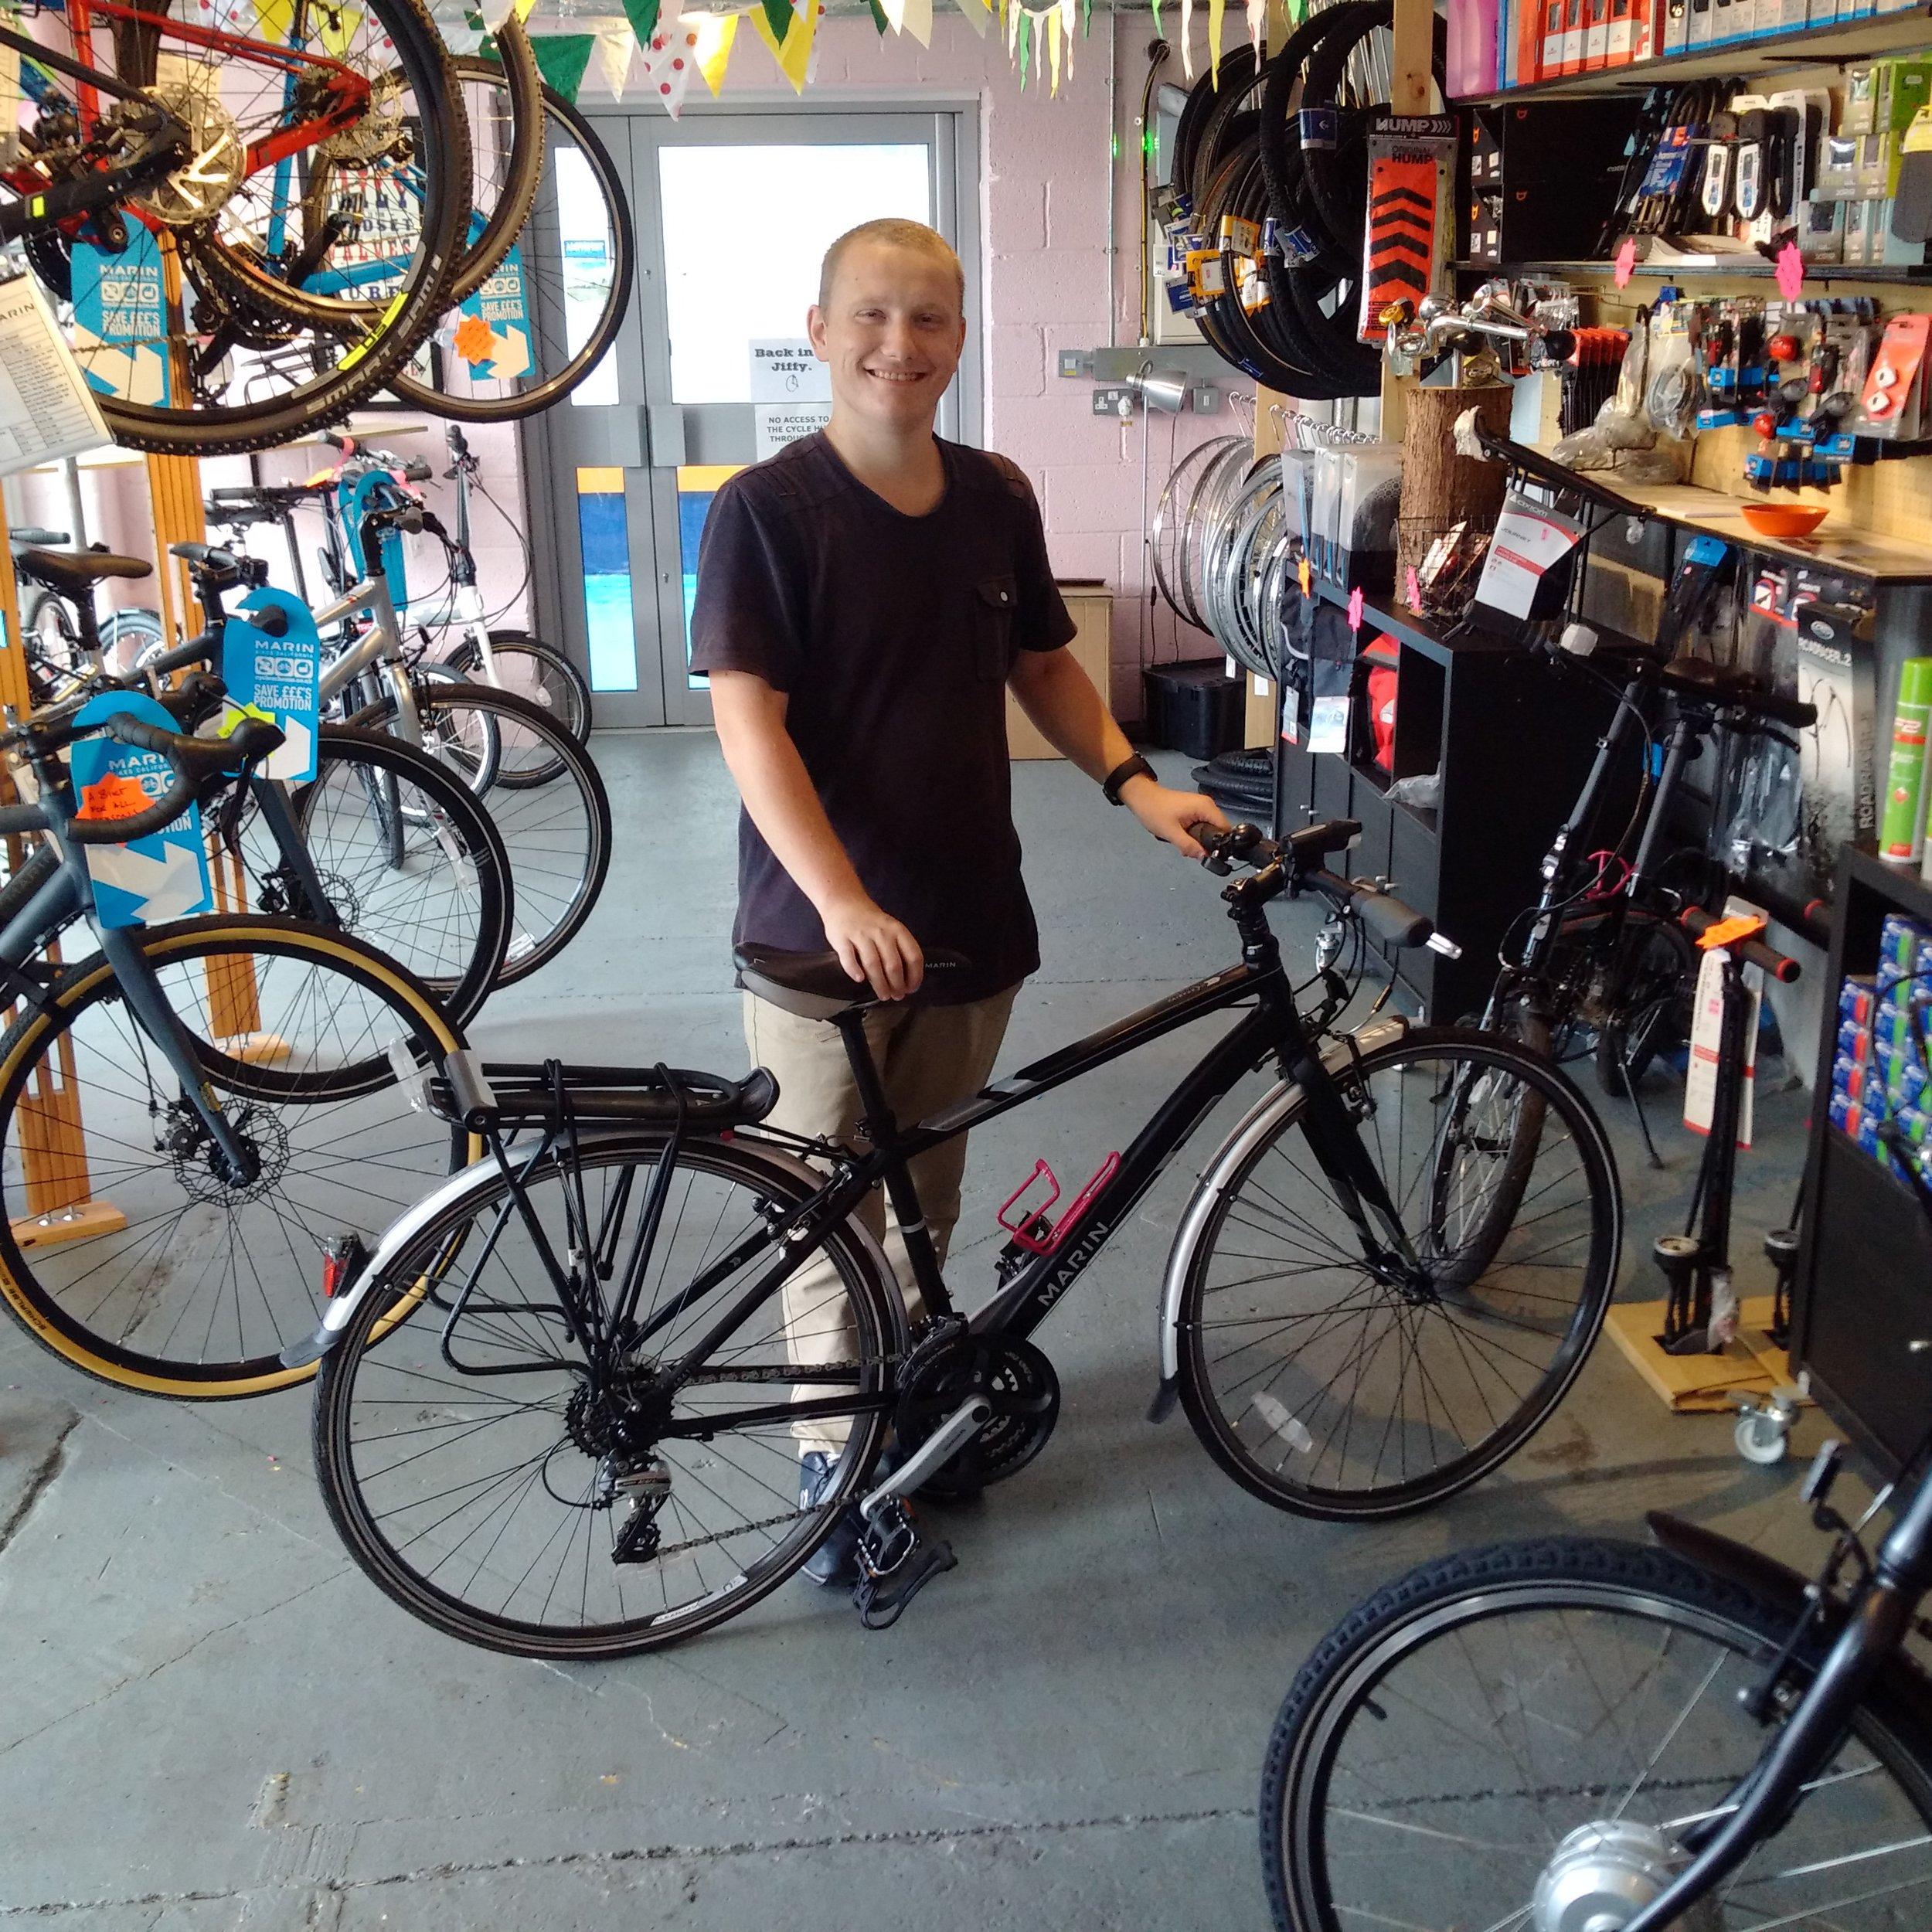 Daniel takes ownership of his Hire Bike